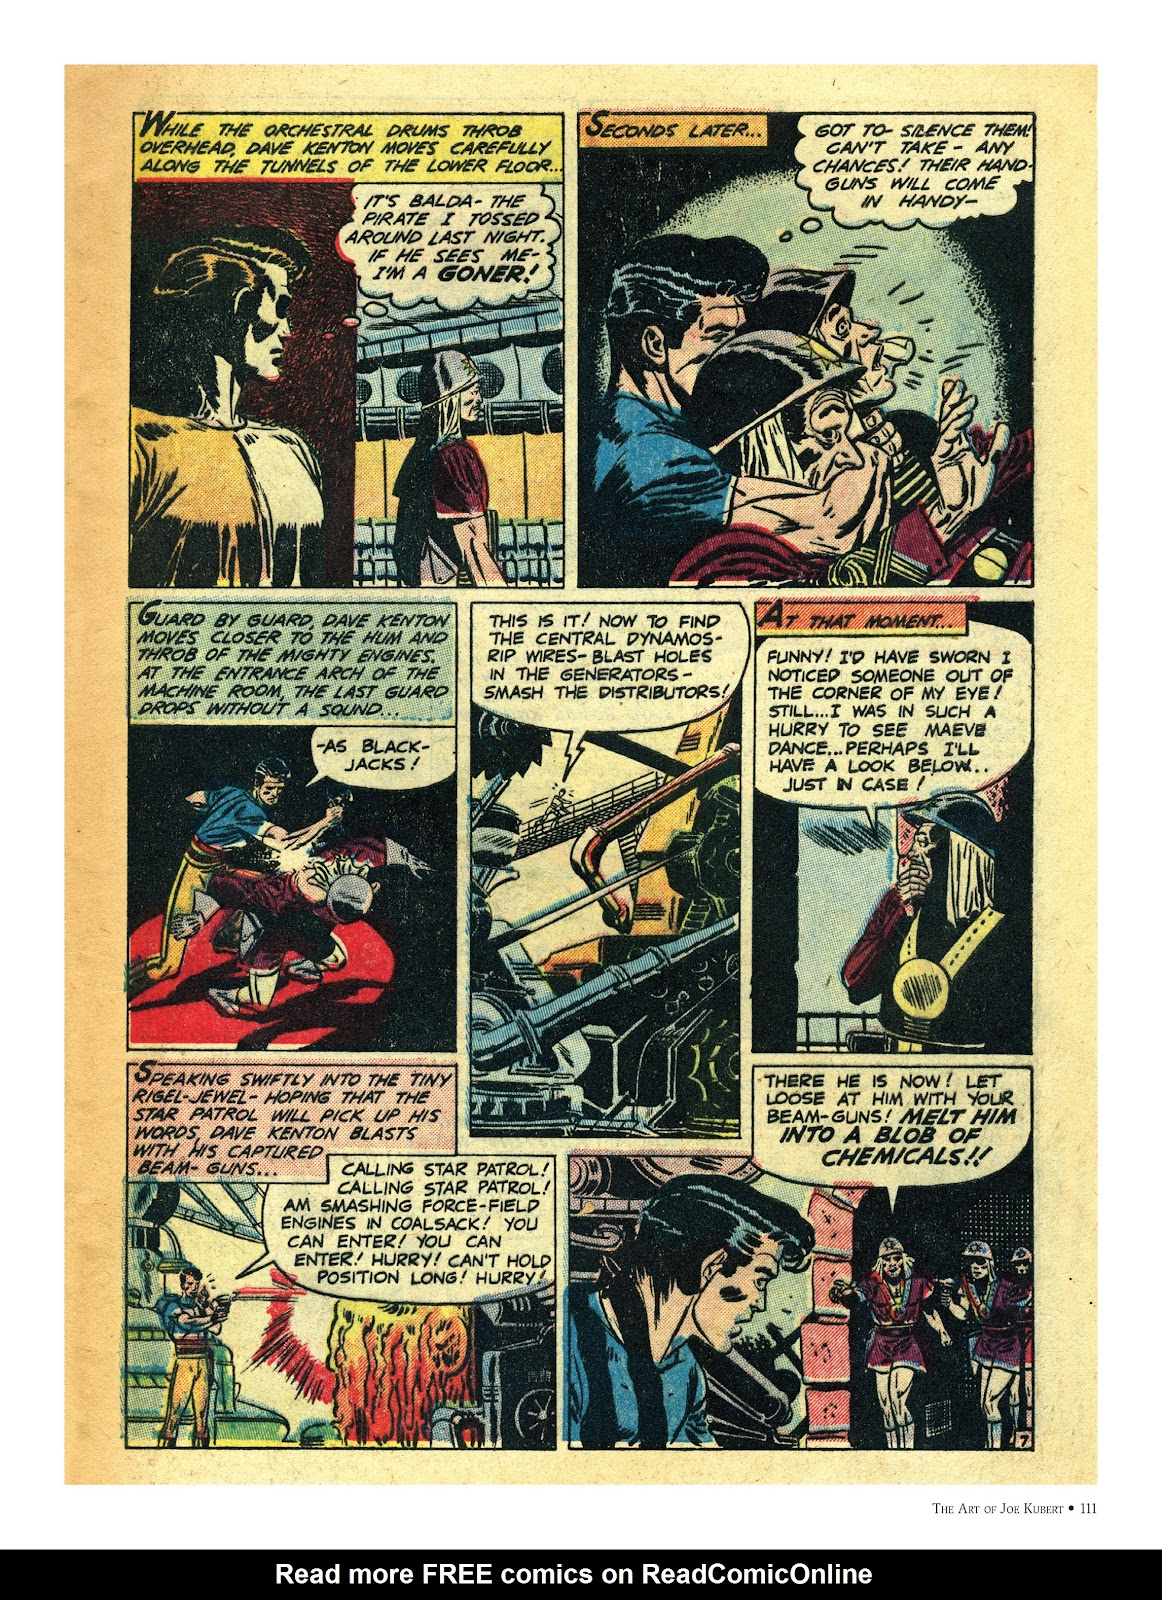 Read online The Art of Joe Kubert comic -  Issue # TPB (Part 2) - 11